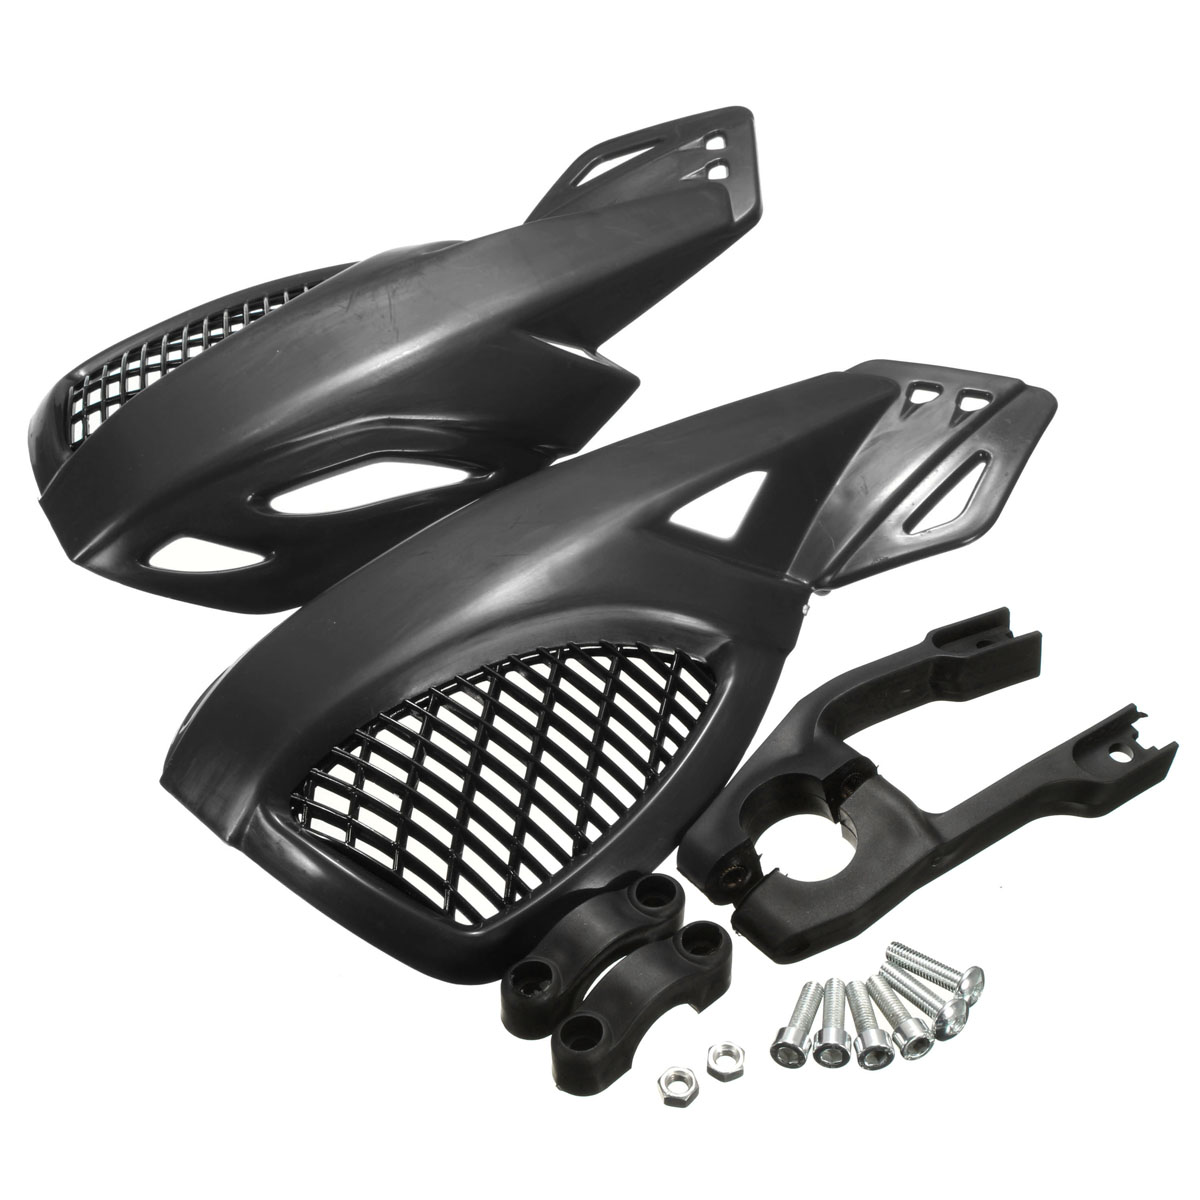 1 Pair Motorcycles Motocross Brush Bar Hand Guards Handguard For Honda /Yamaha /Suzuki /KTM ATV Dirt Bikes